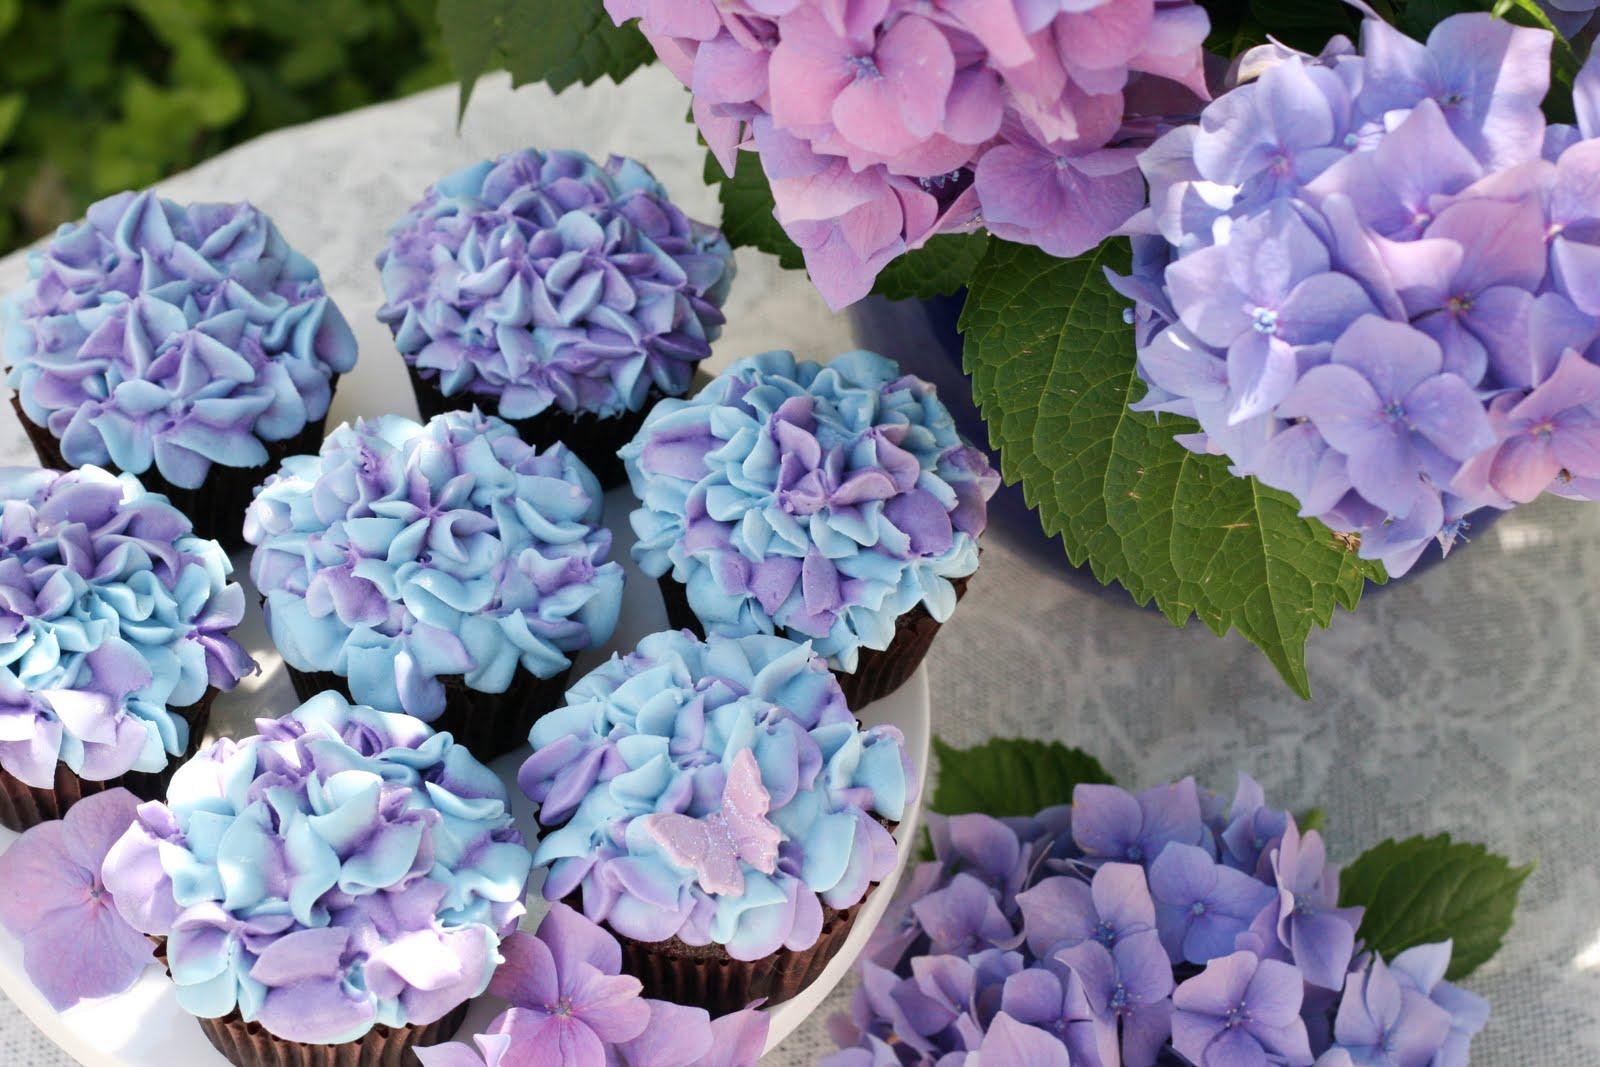 Cake Decorating Hydrangea Flowers : Hydrangea Cupcakes   Glorious Treats